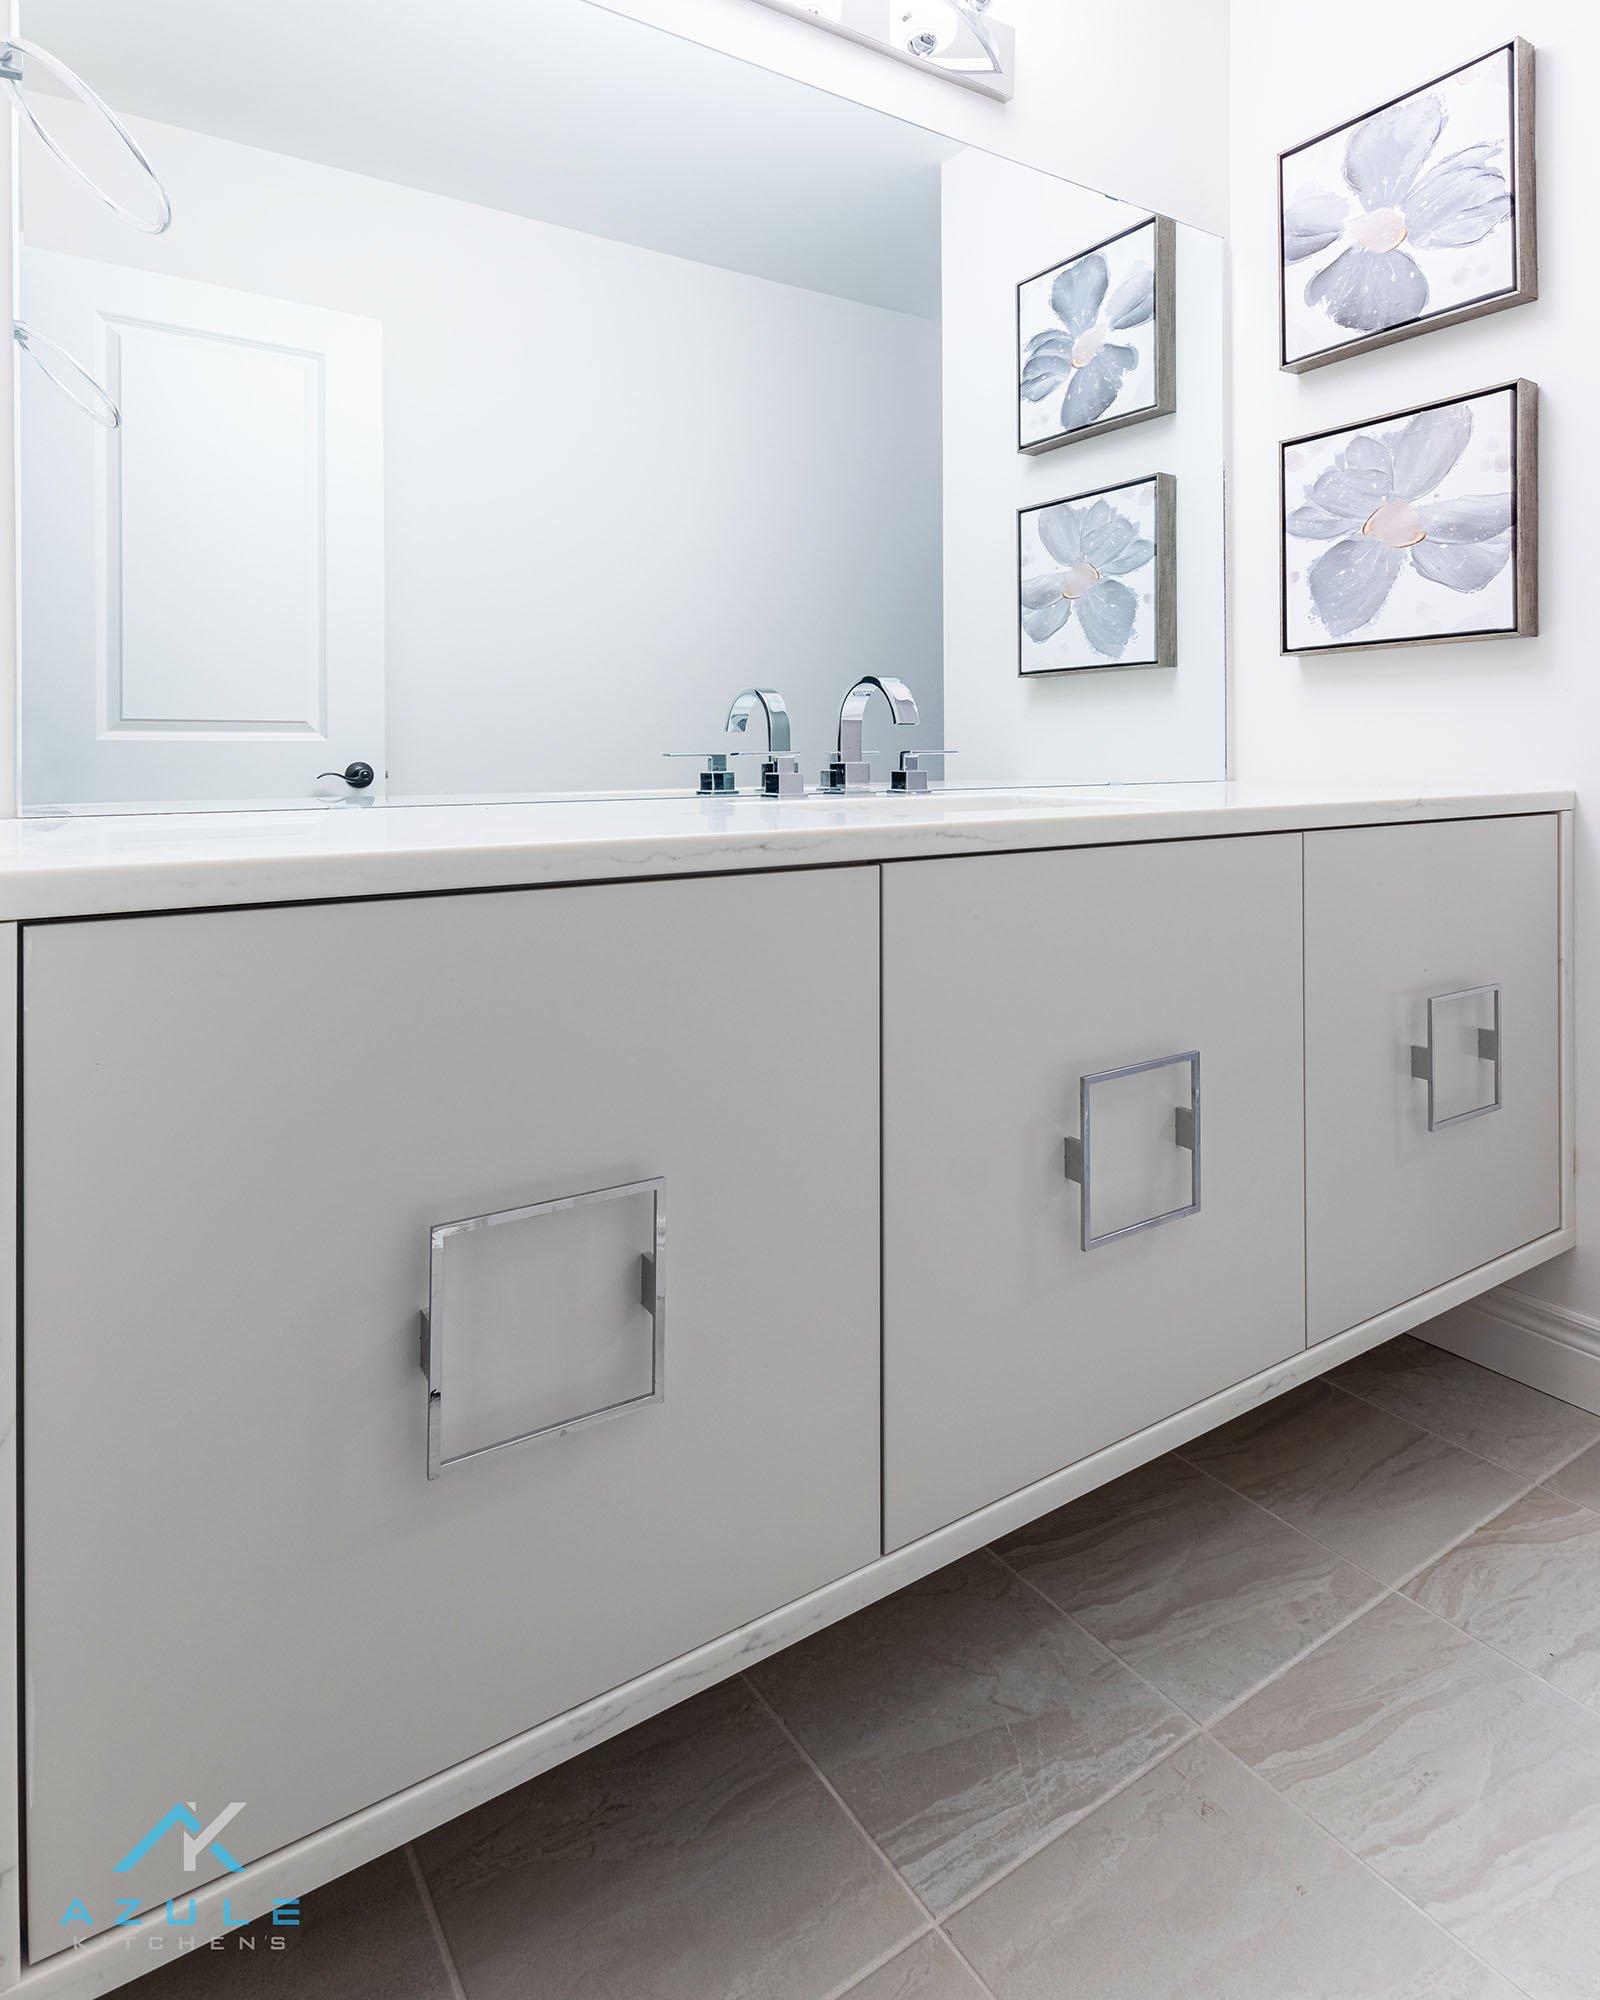 Azule Kitchens – Make a Super-Simple Bath Cabinet